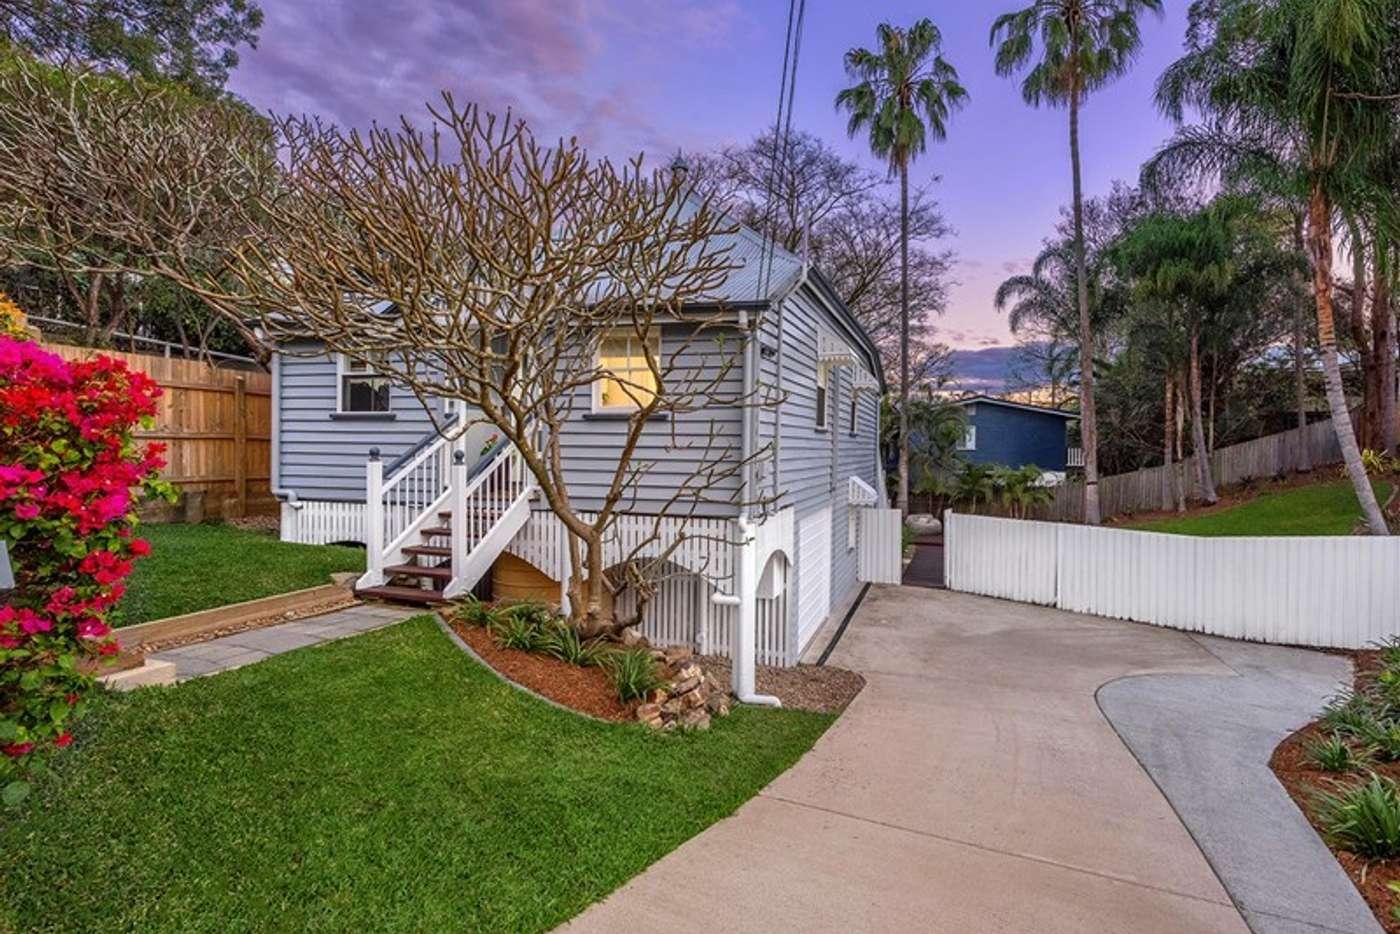 Main view of Homely house listing, 26 Soudan Street, Bardon QLD 4065